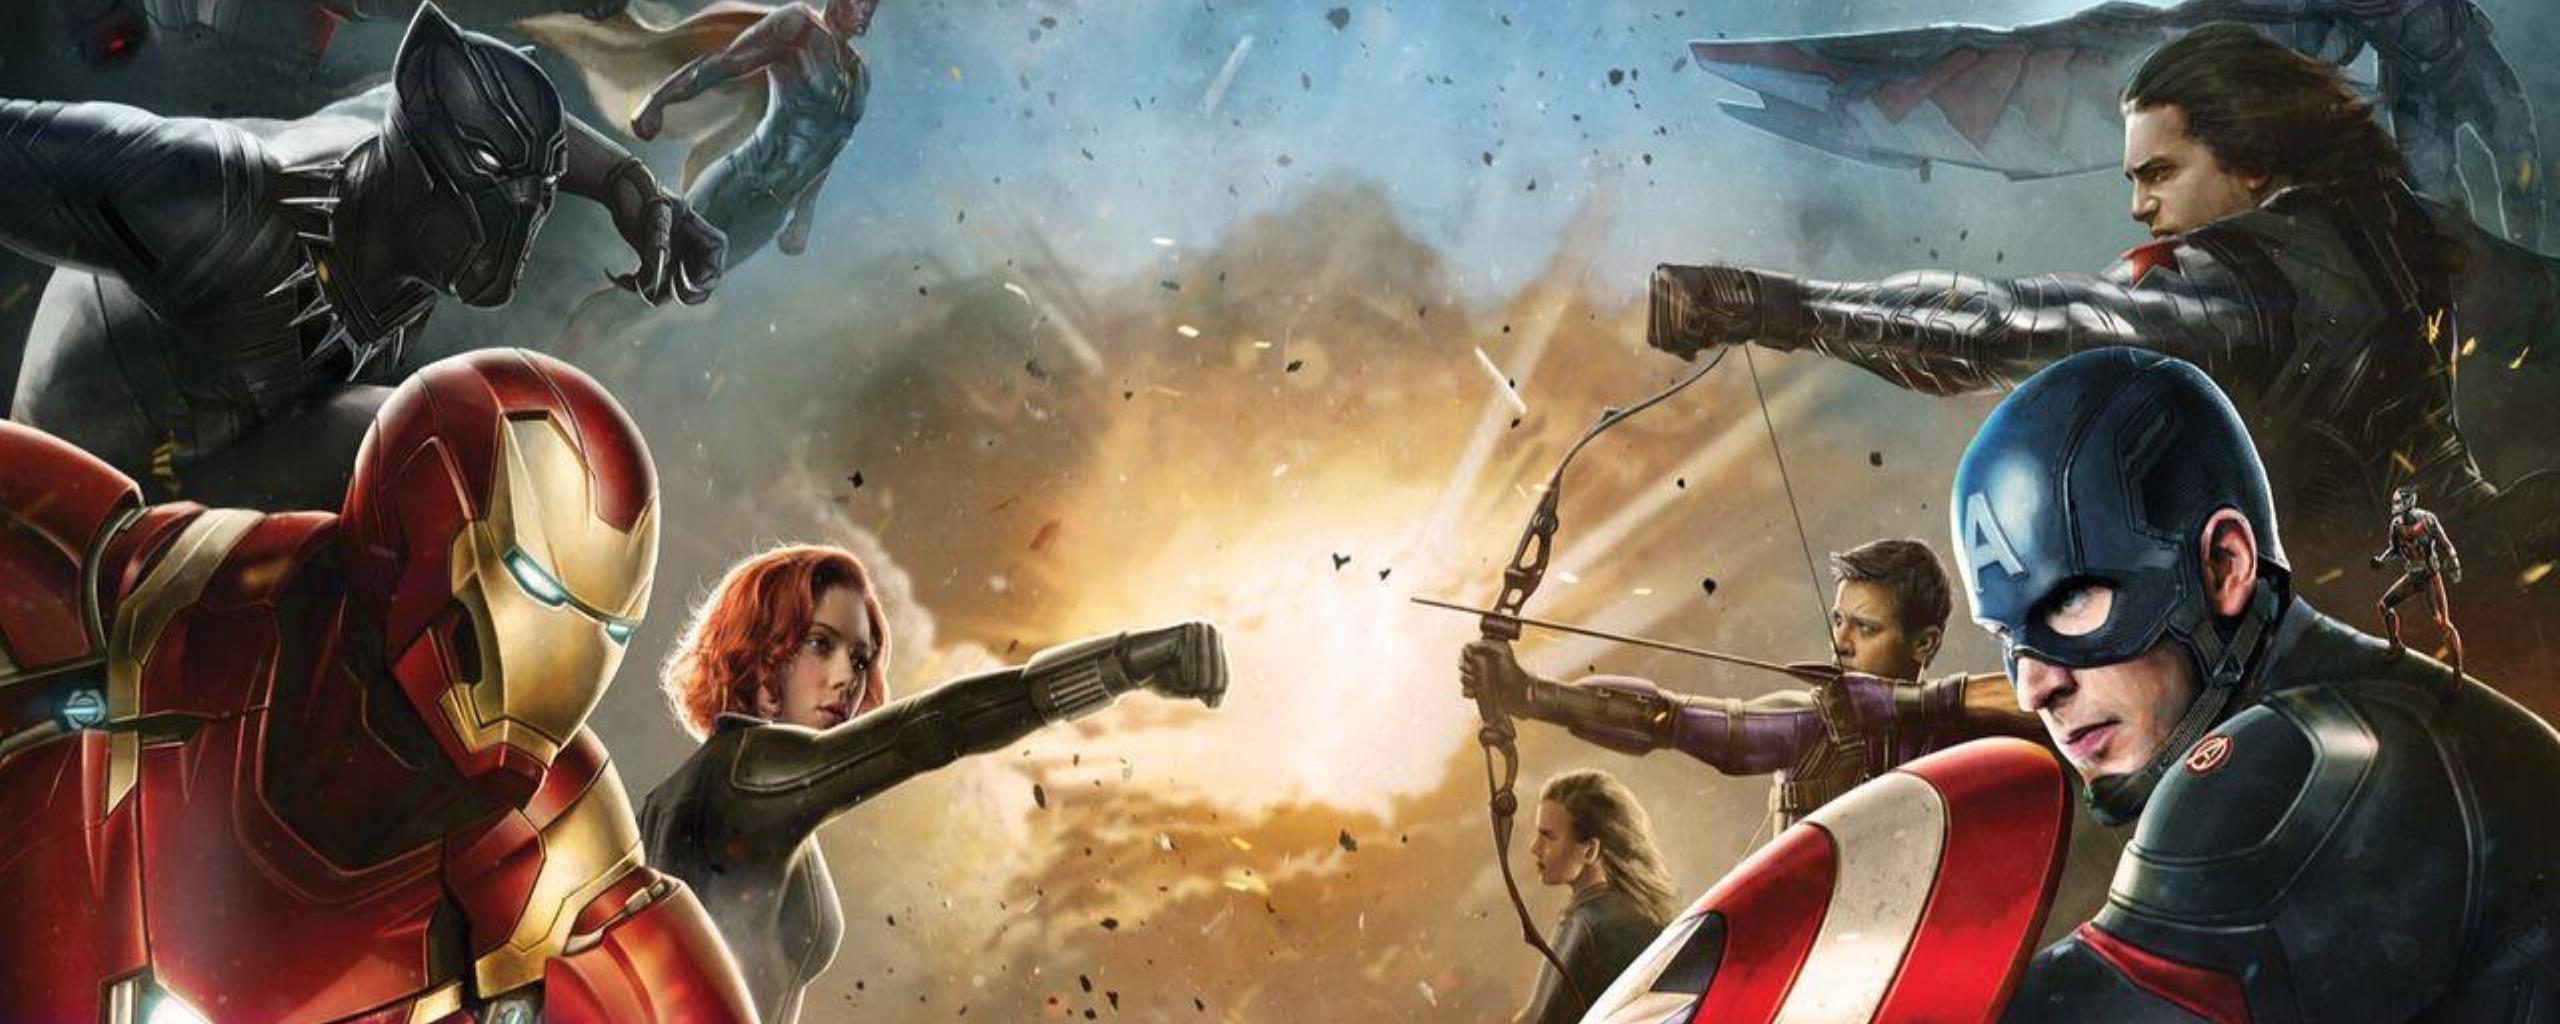 Captain America Civil War Movie Wallpapers HDwallpaperUP 2560x1024